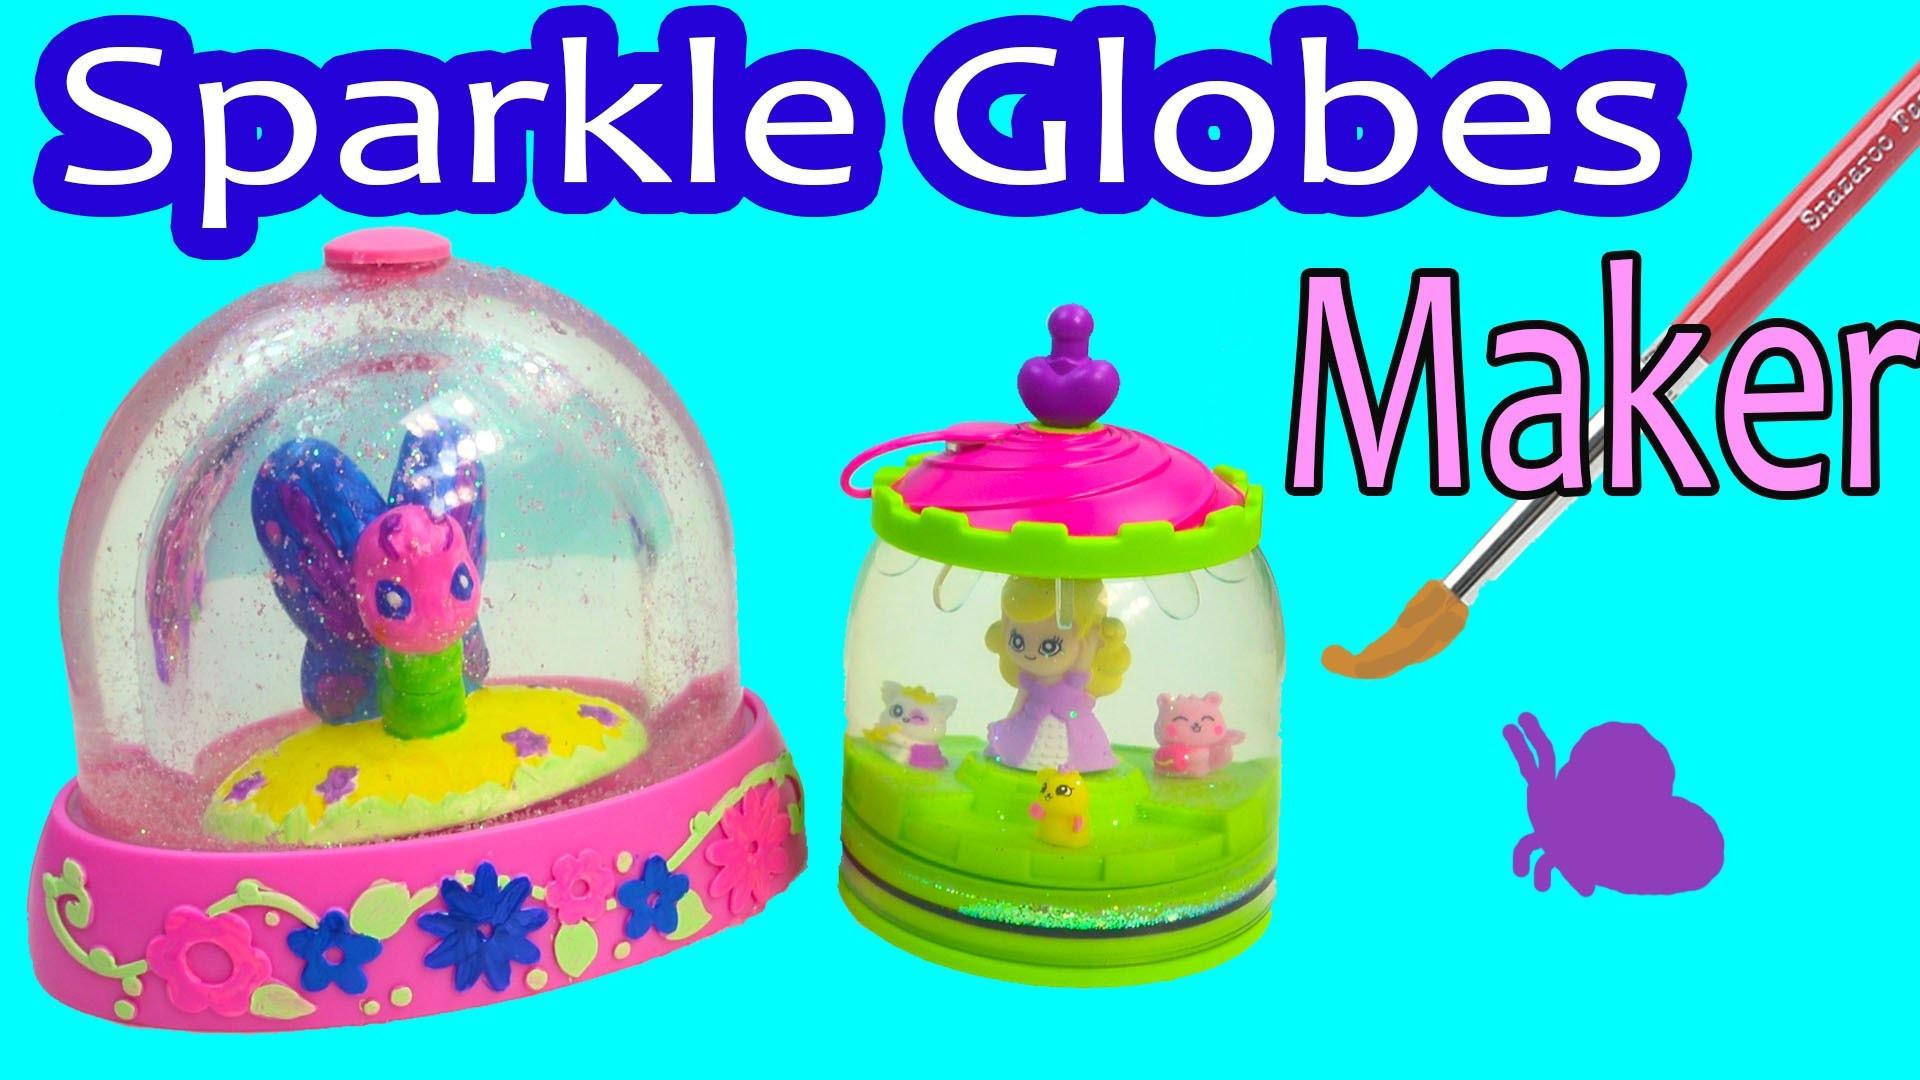 Mega Glitzi Globes Inspired Water Glitter Sparkle Globes Maker DIY Craft Playset Toy Unboxing